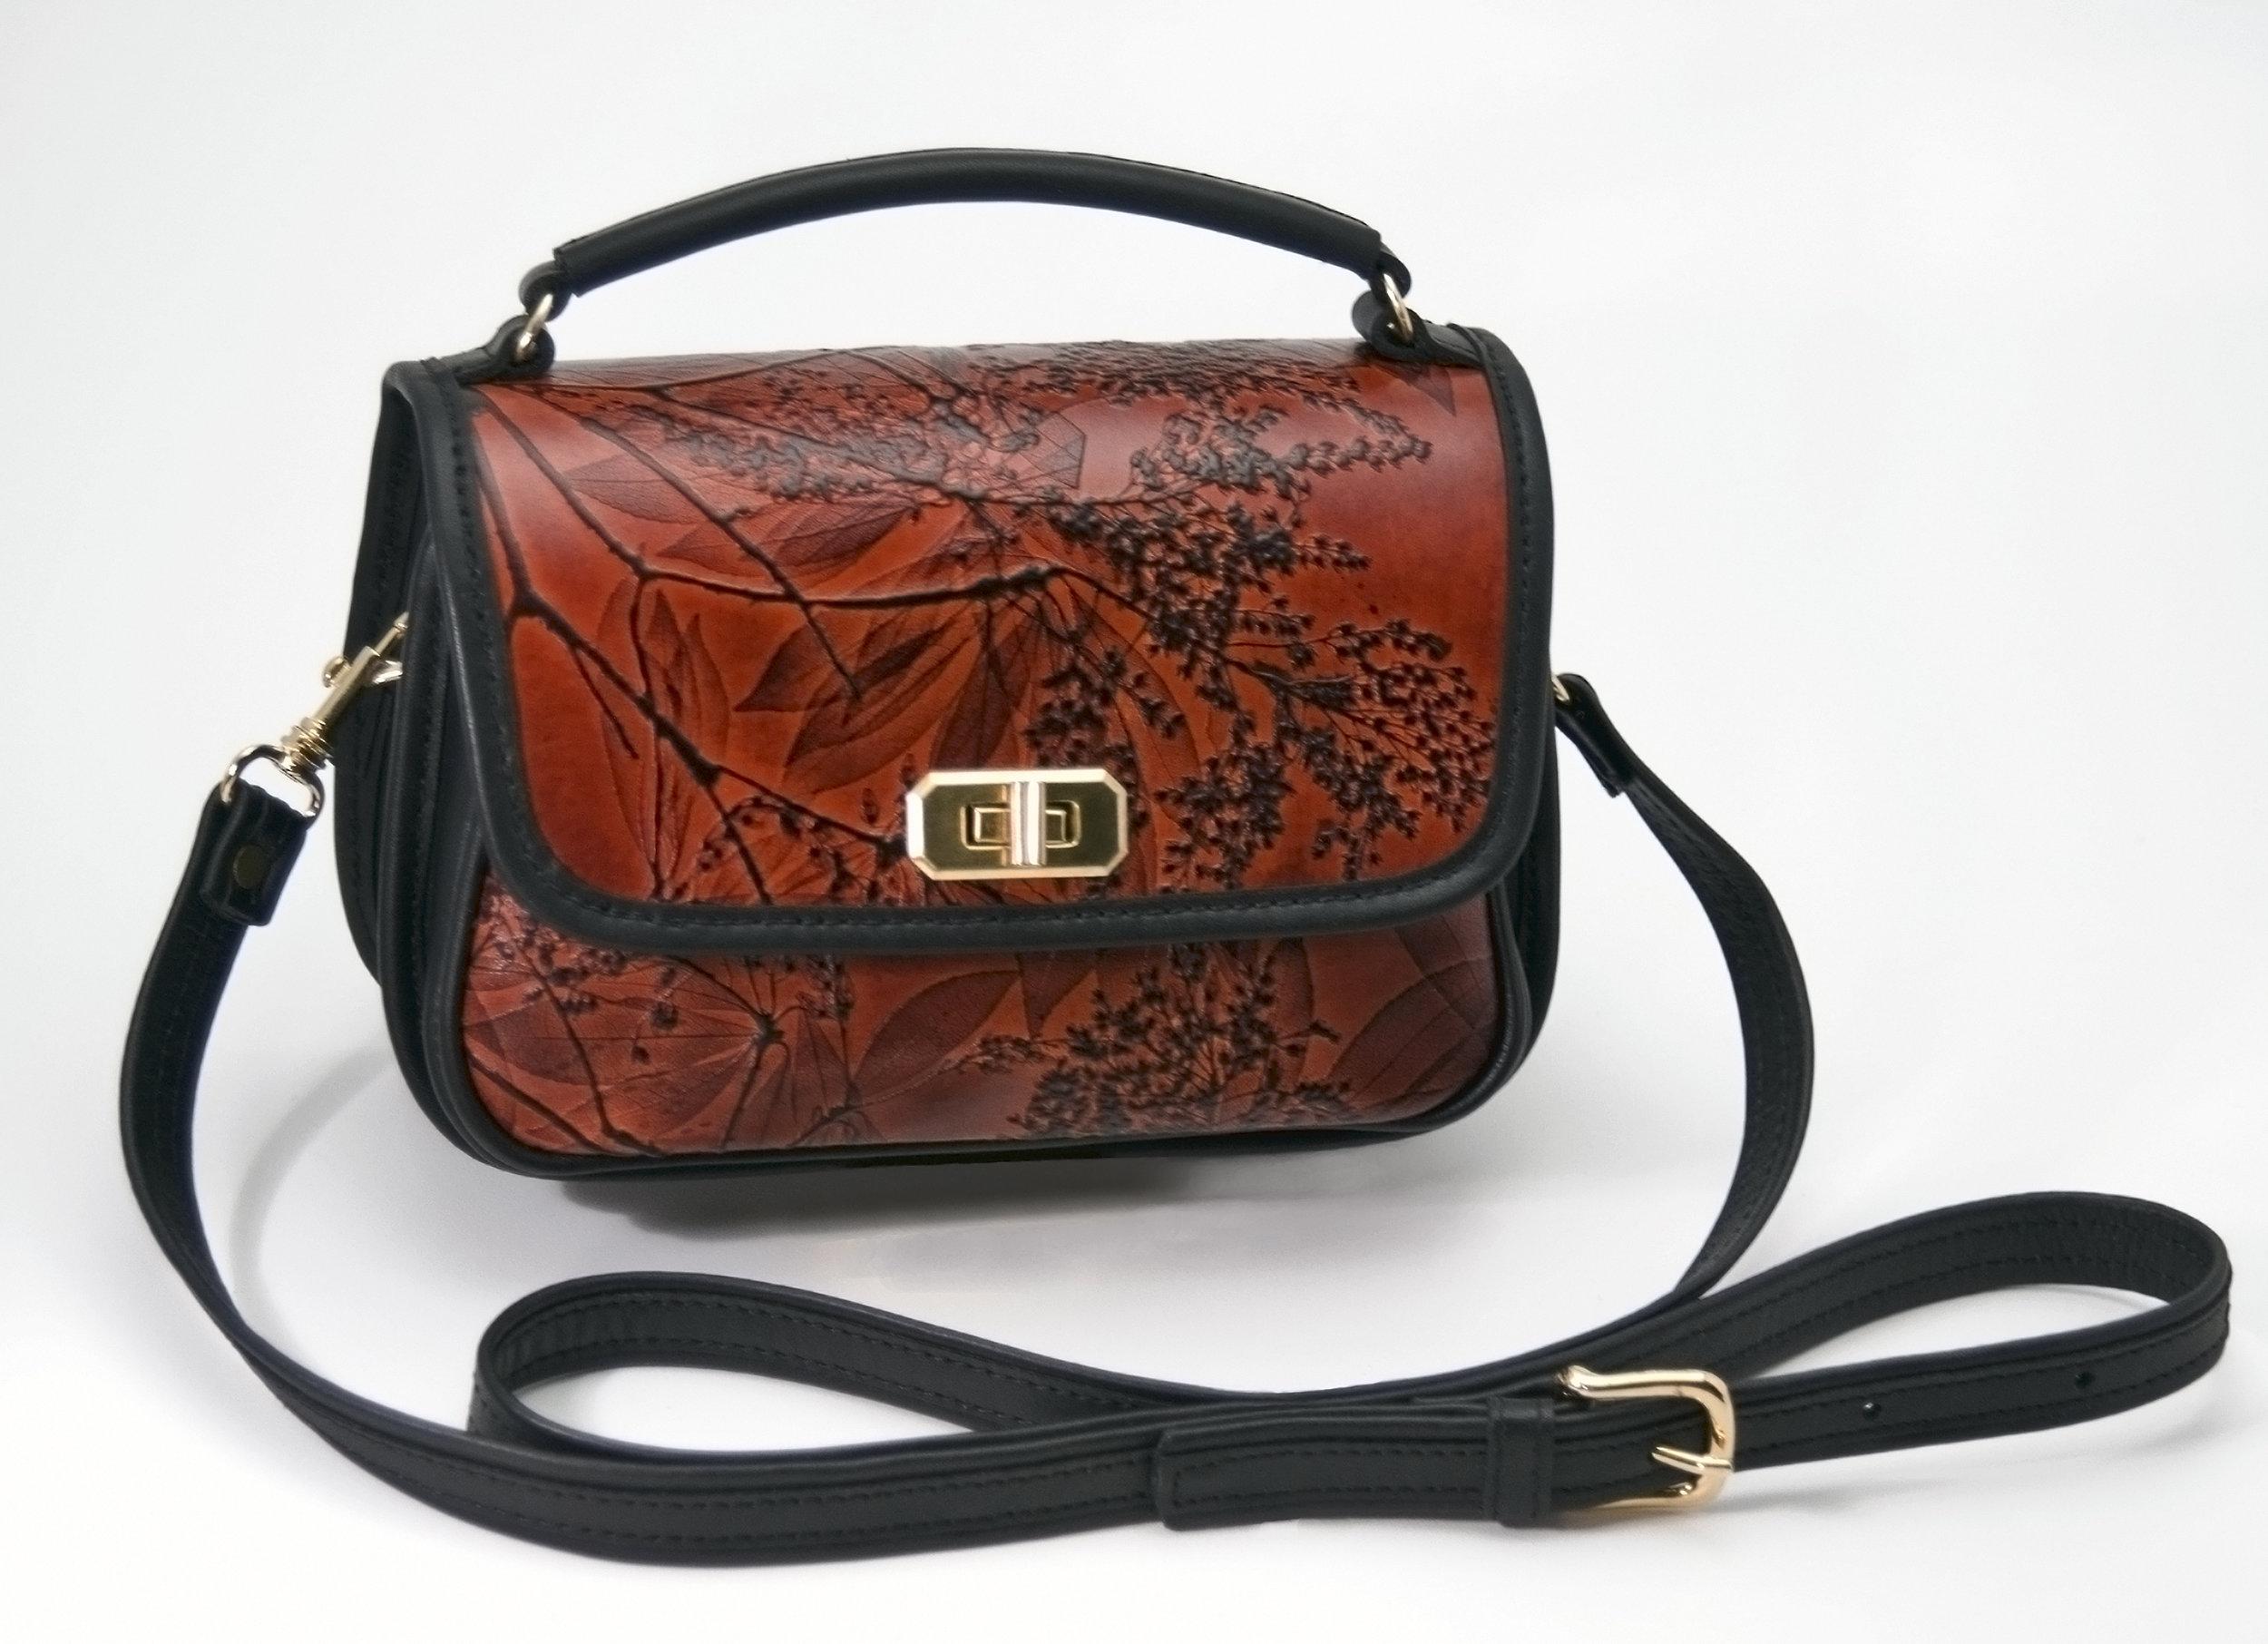 #643 Satchel Bag andromeda.jpg